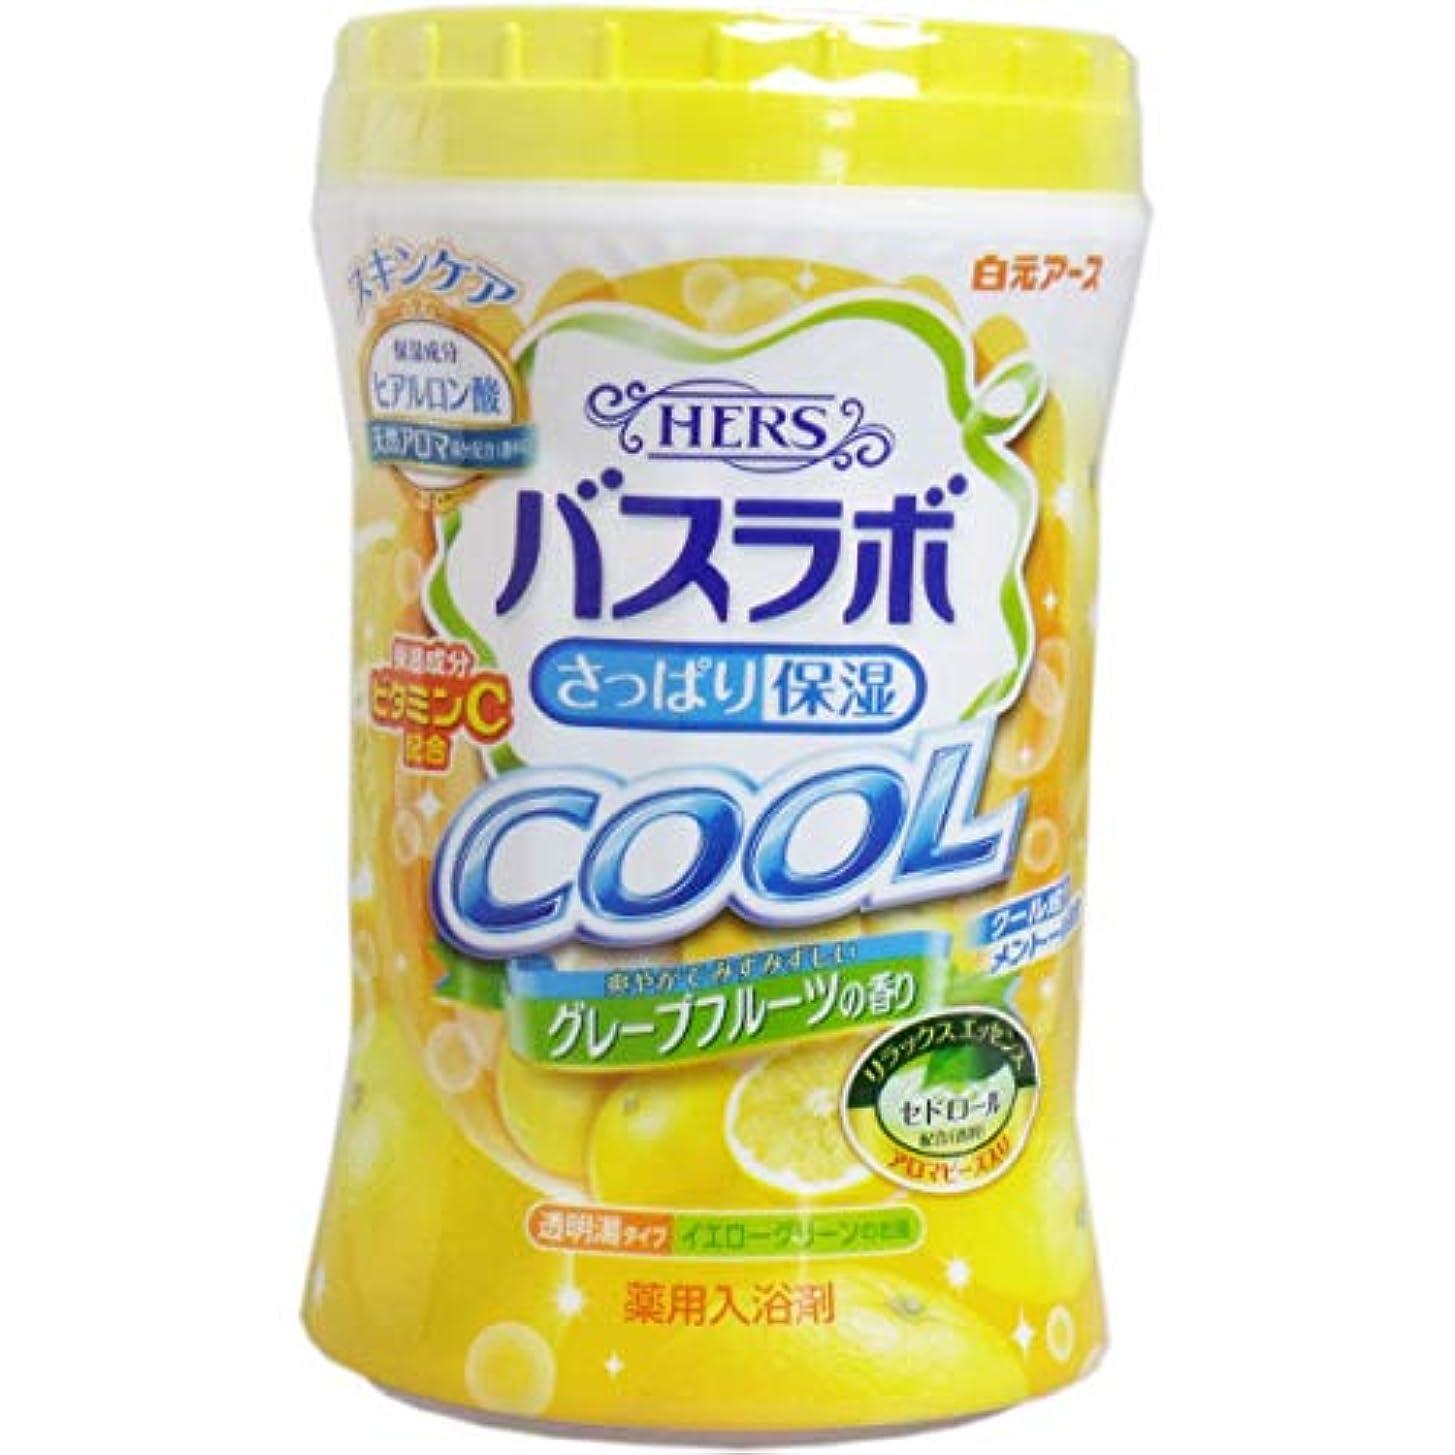 HERSバスラボ ボトル クール グレープフルーツの香り 640g × 15点